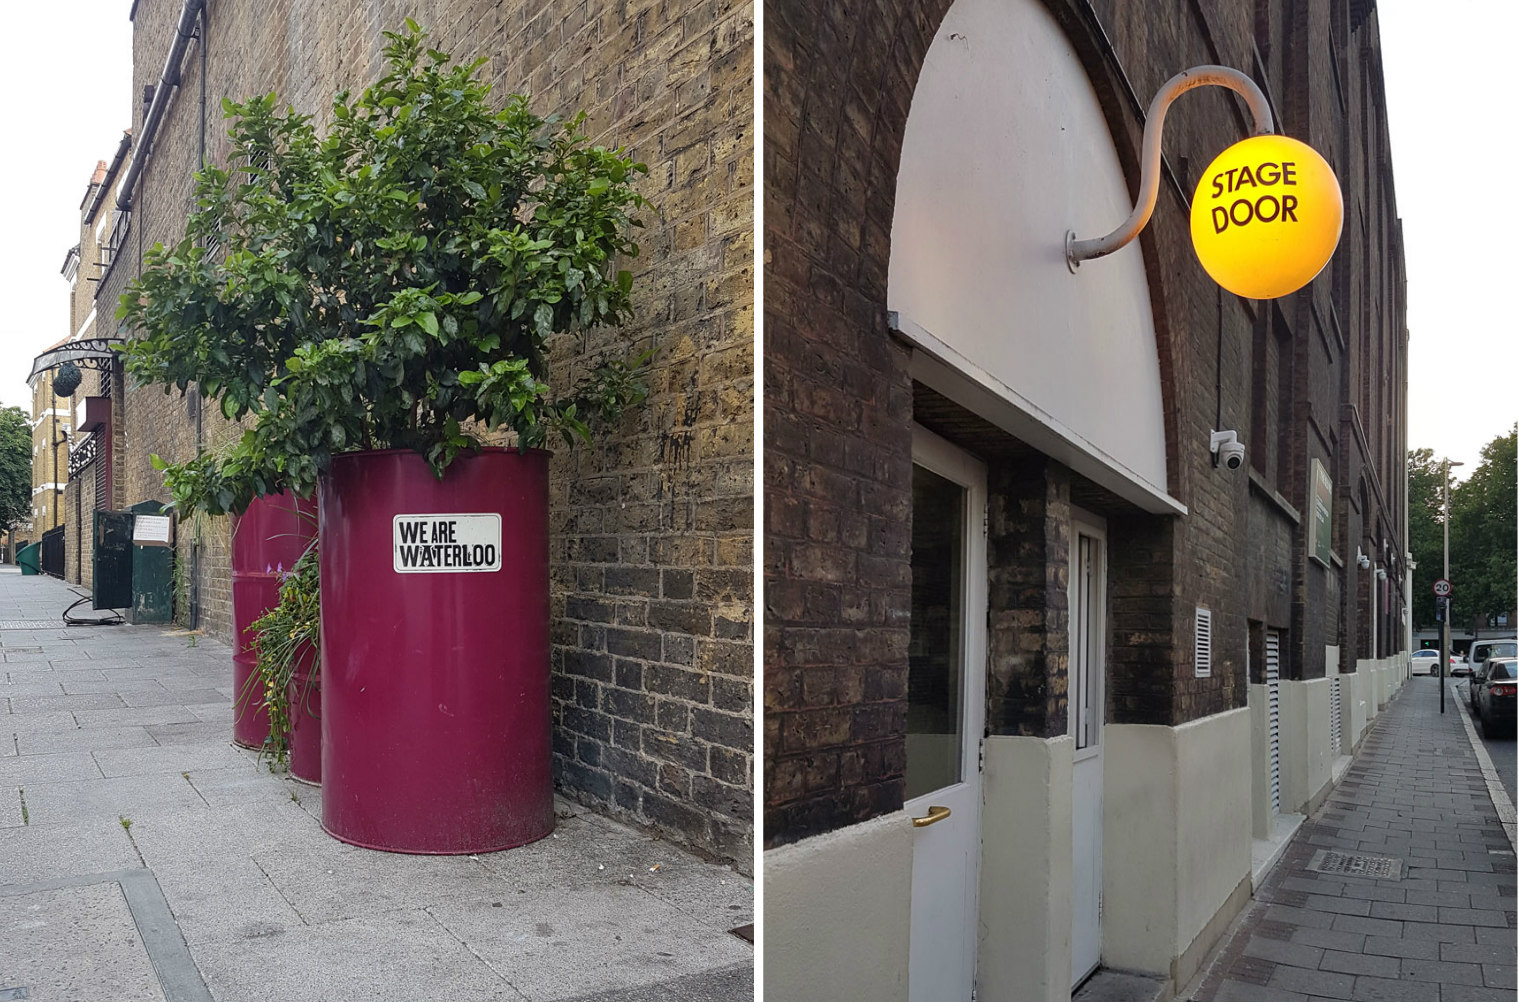 london-photo-diary-waterloo-street-plants